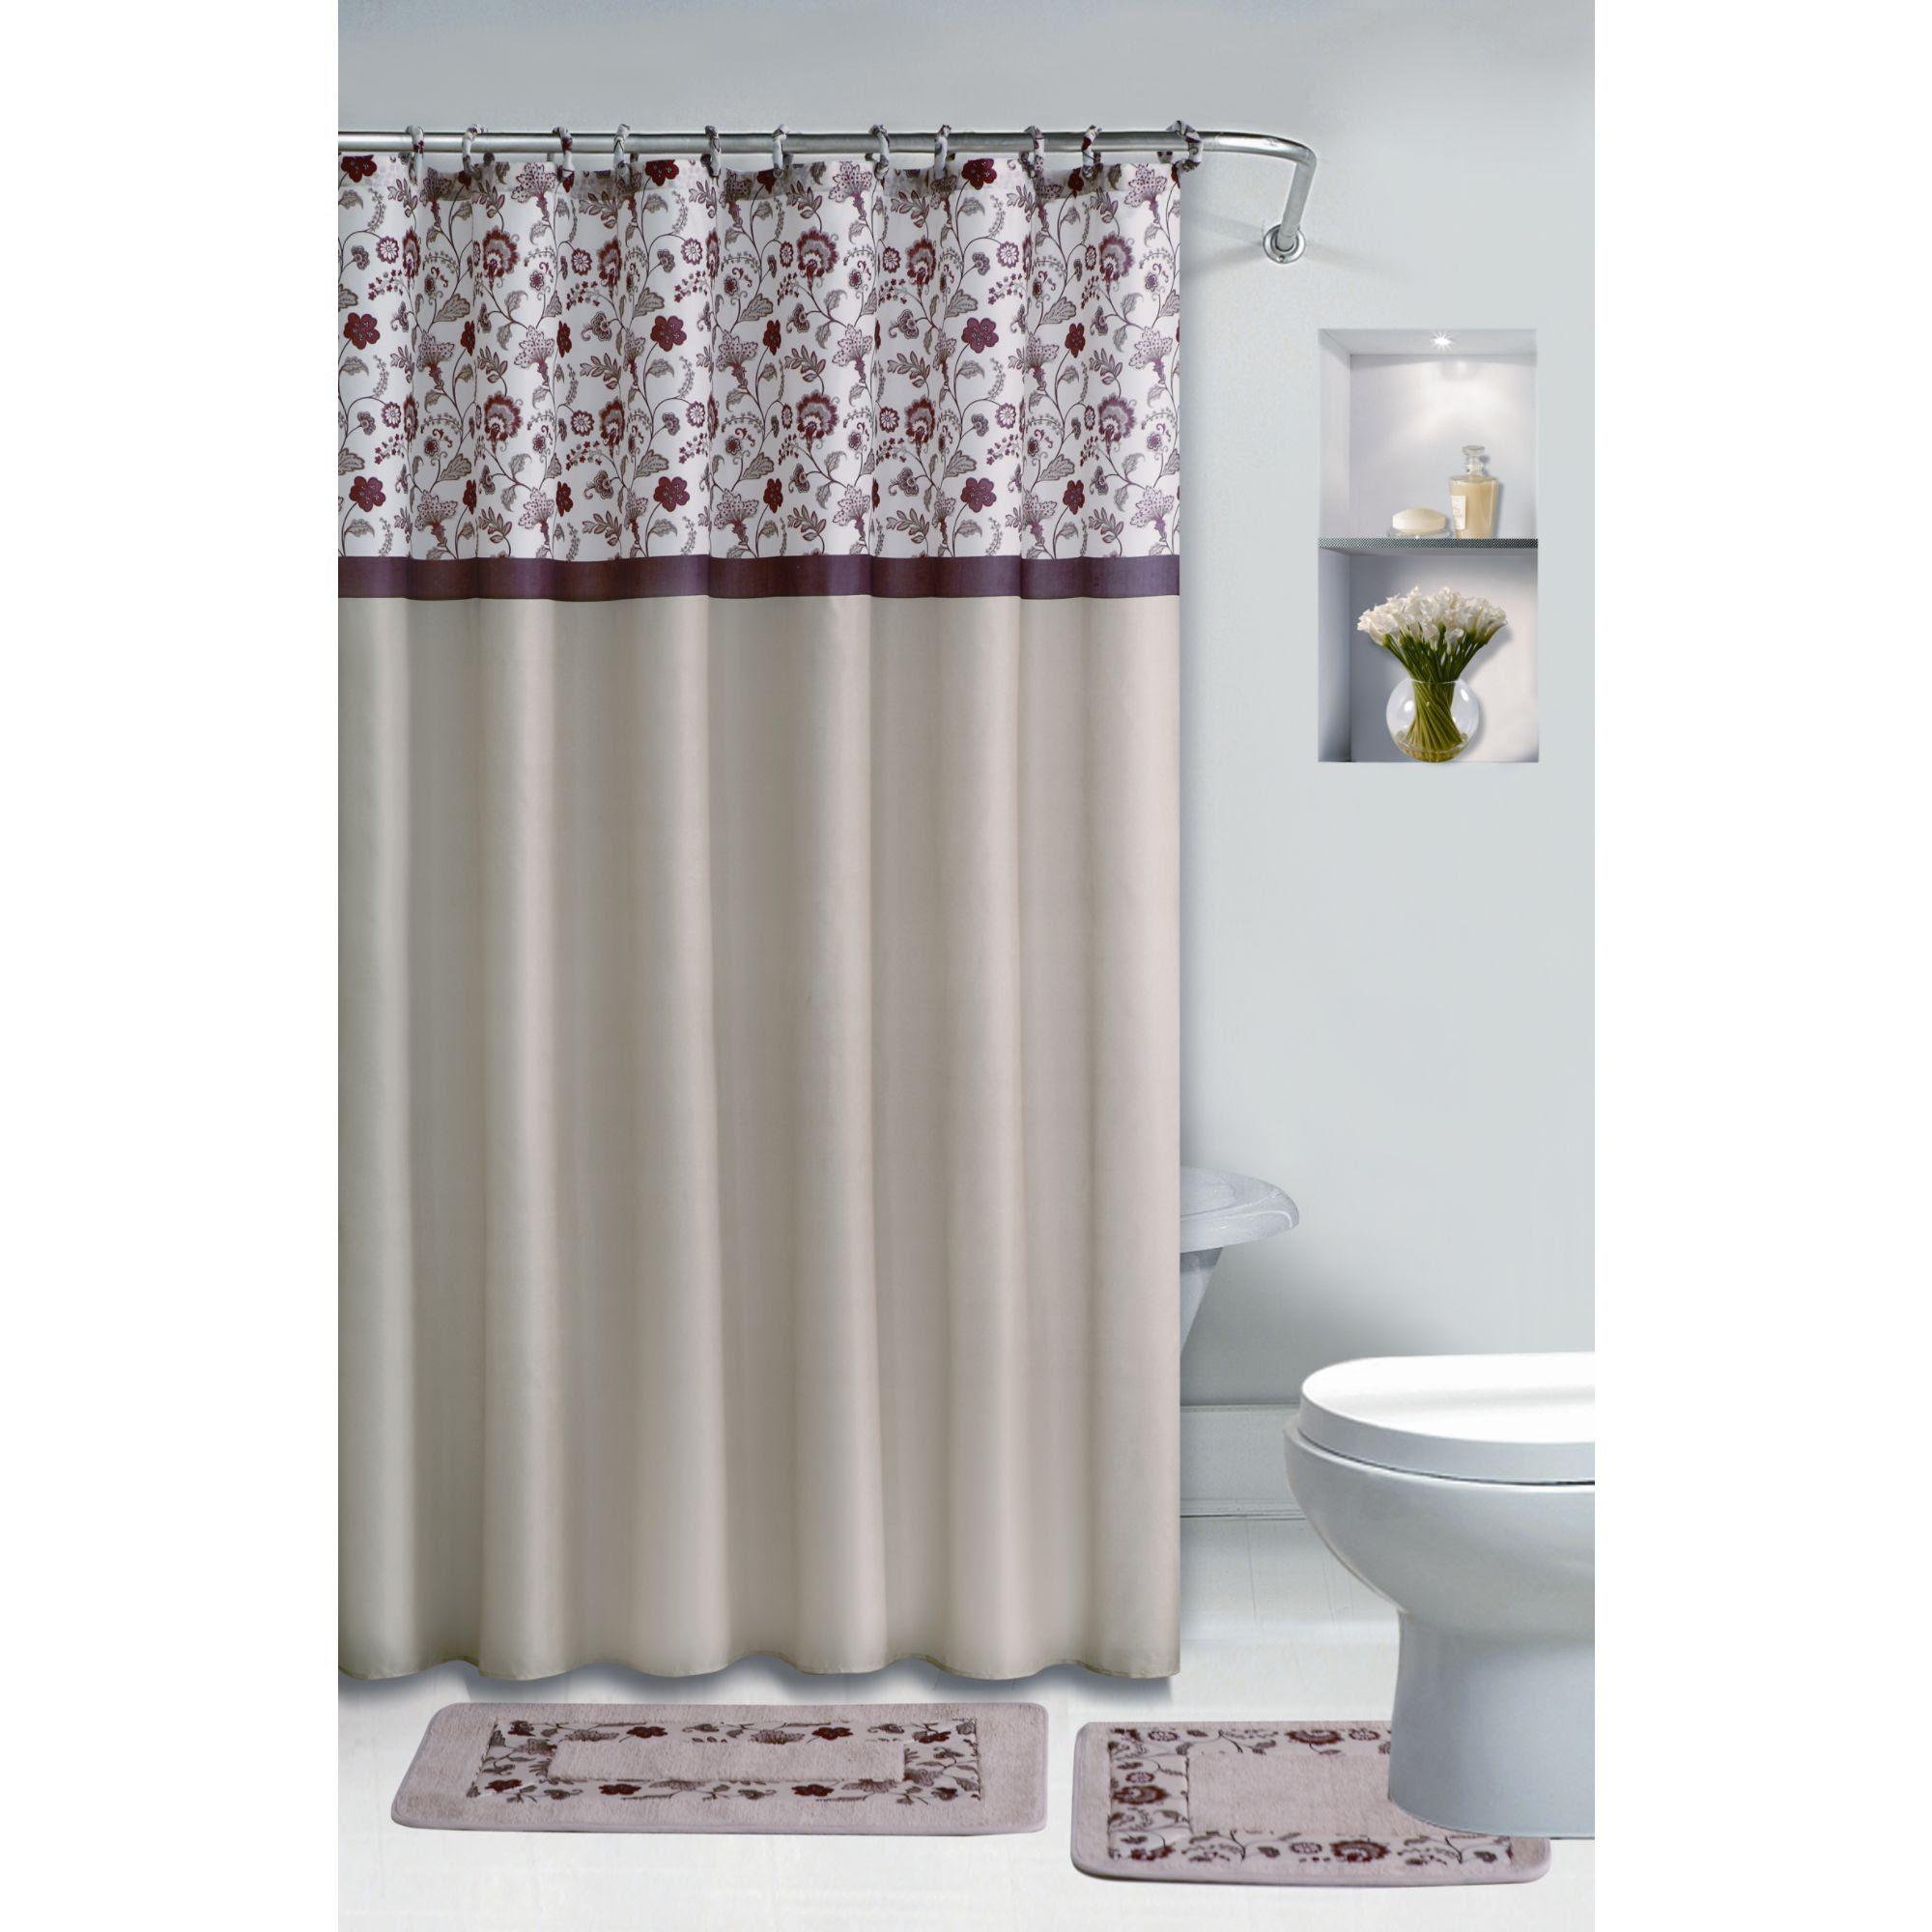 Essential Home 15pc Bath Set- Melbourne - Bed & Bath - Shower ...